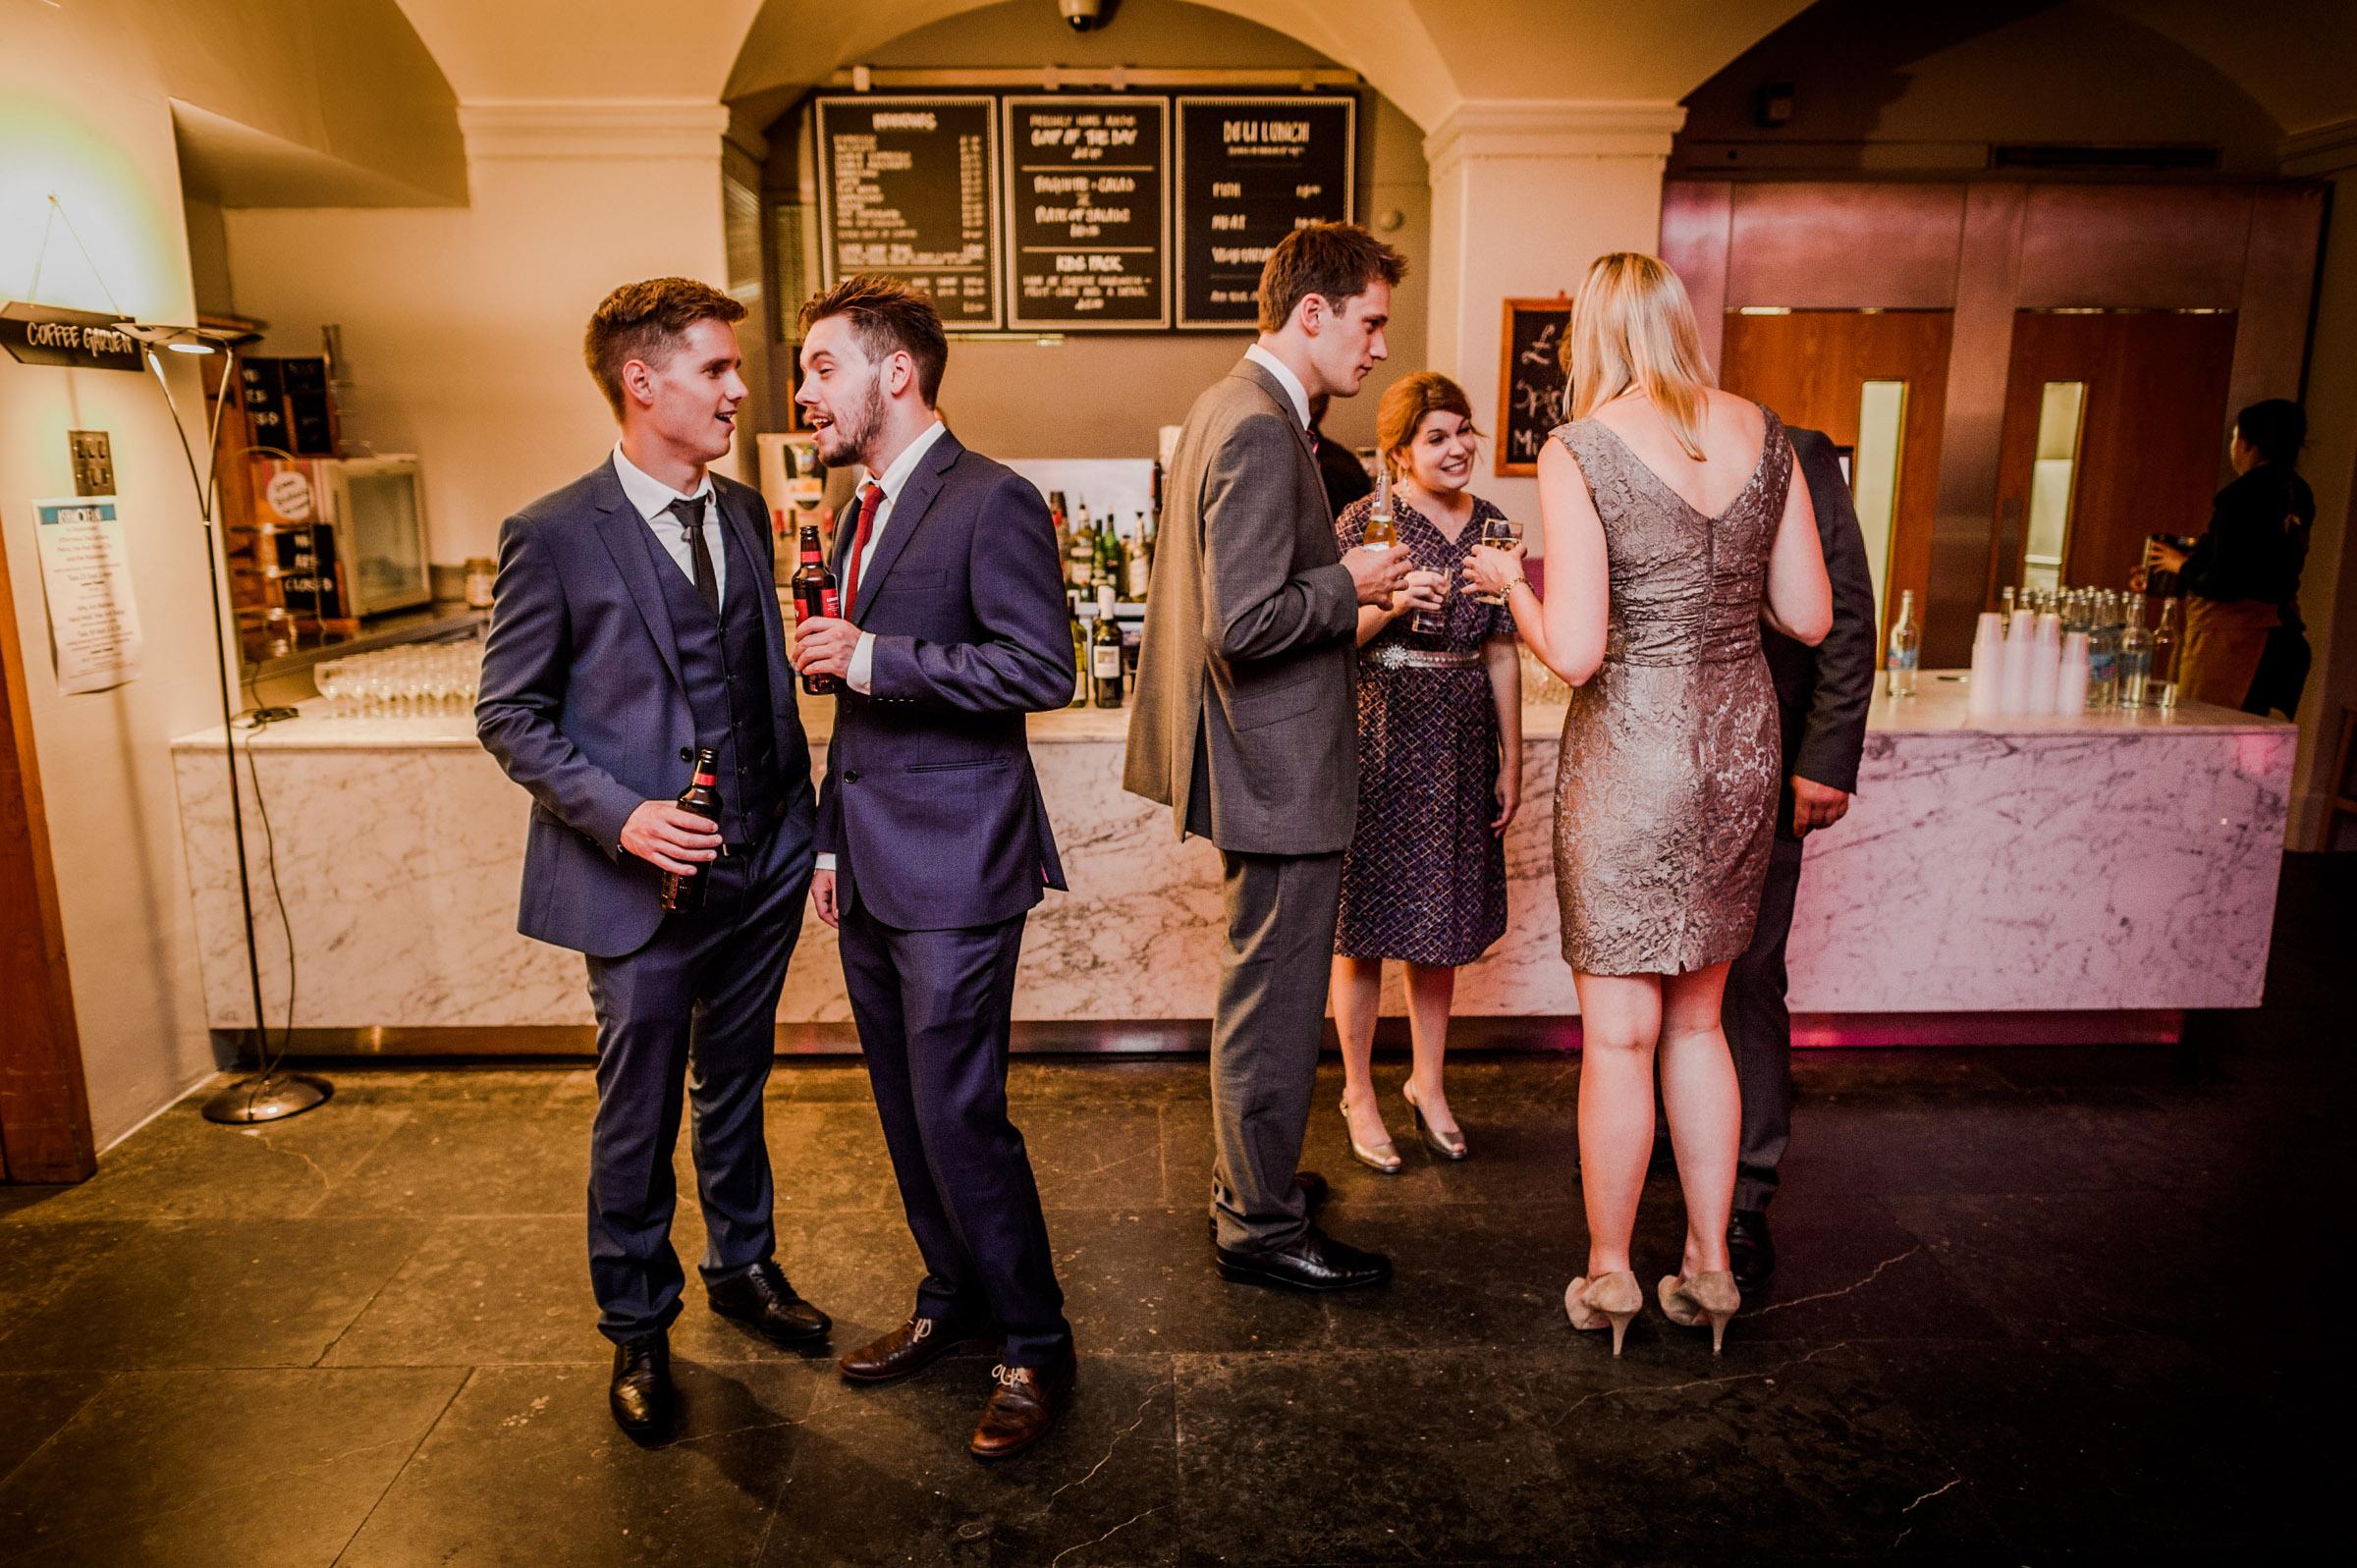 Ashmolean-Museum-Wedding-Pictures-0074.jpg